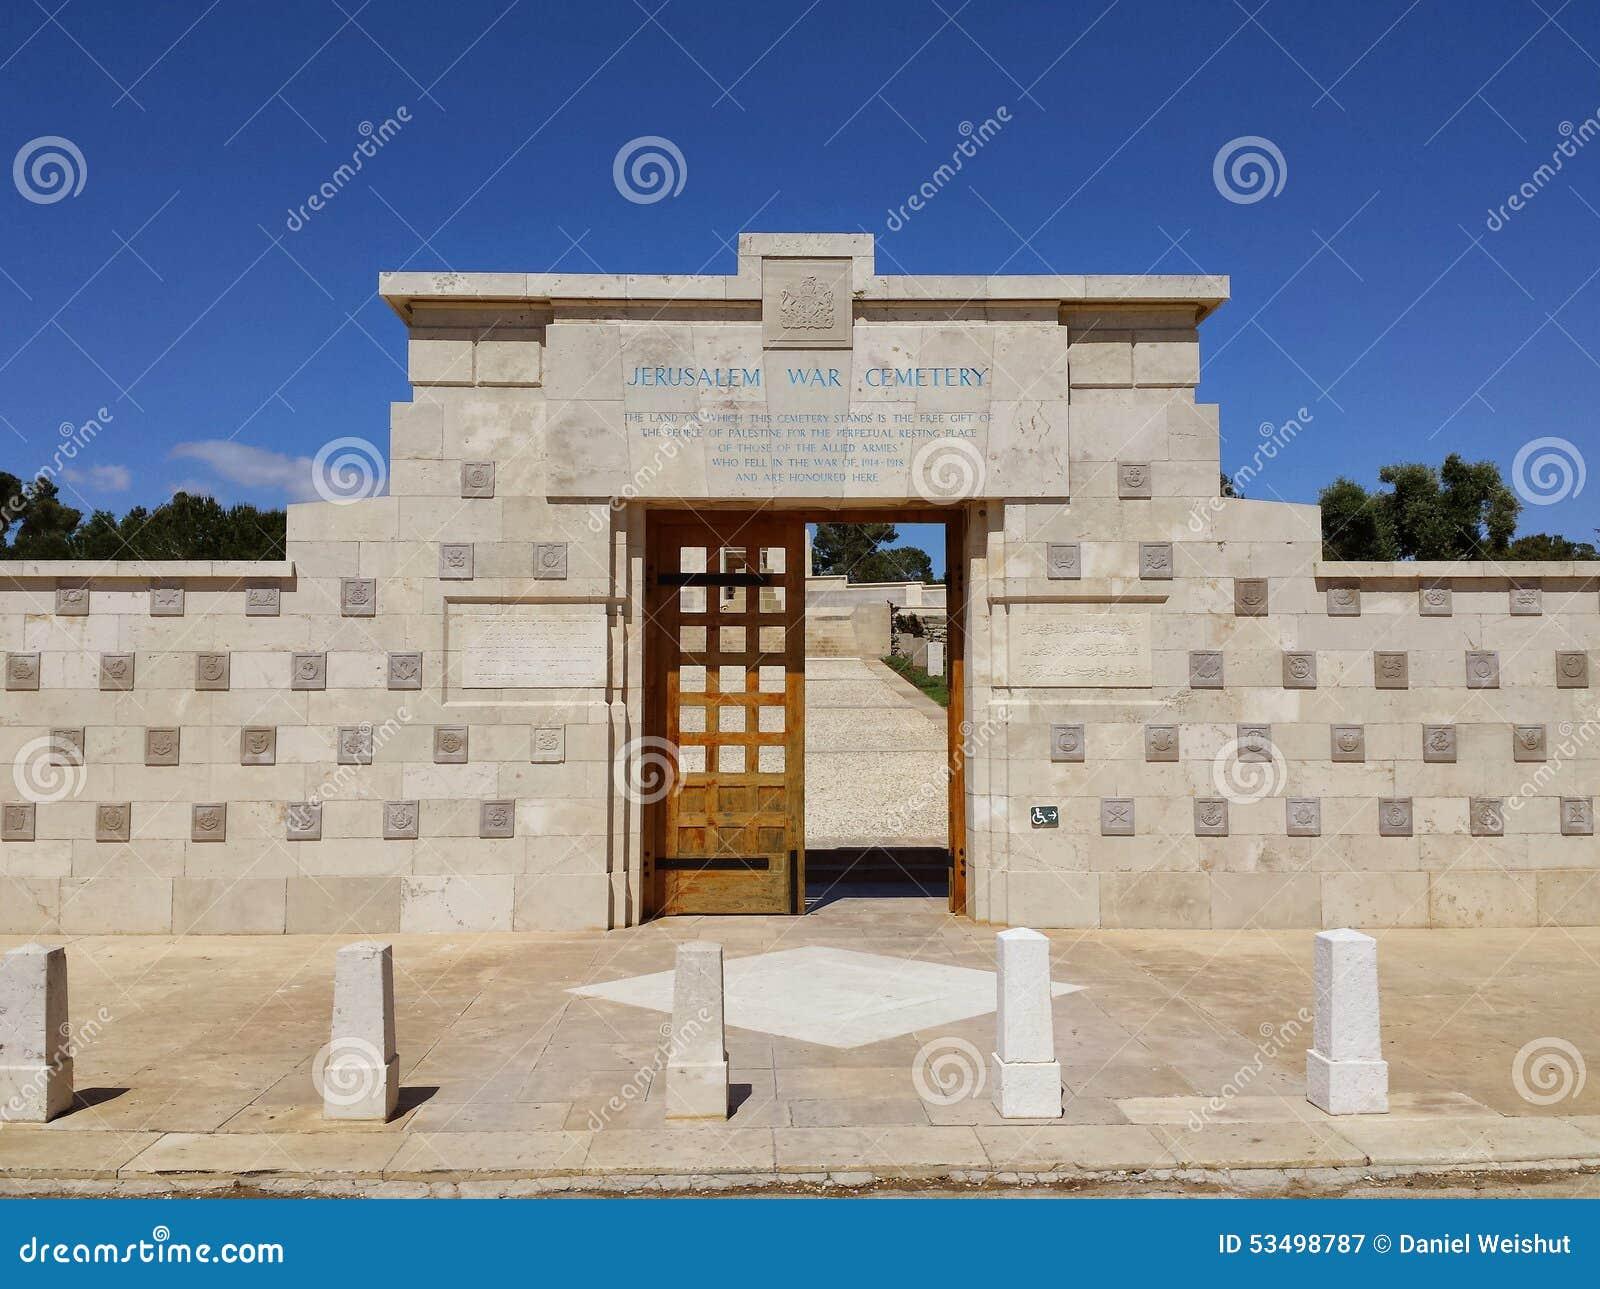 World War I cemetery Jerusalem